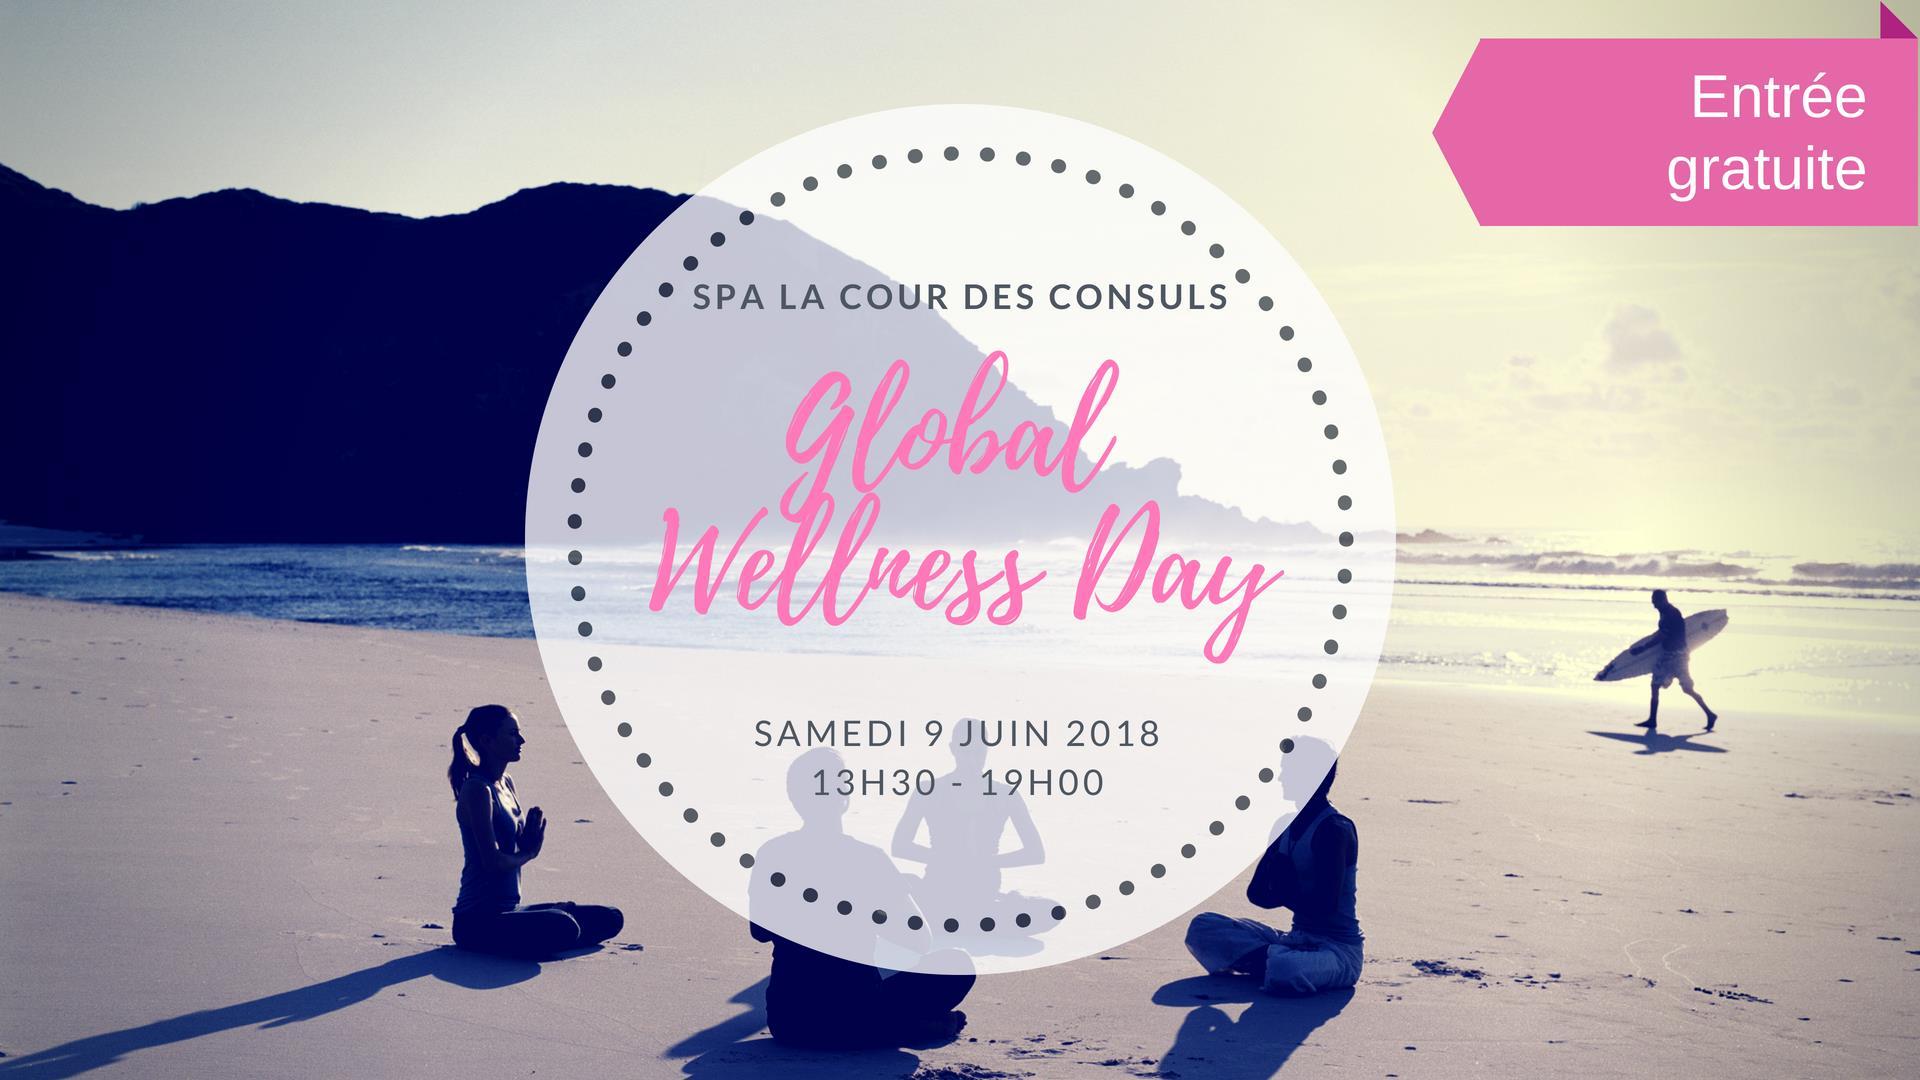 Global Welness Day